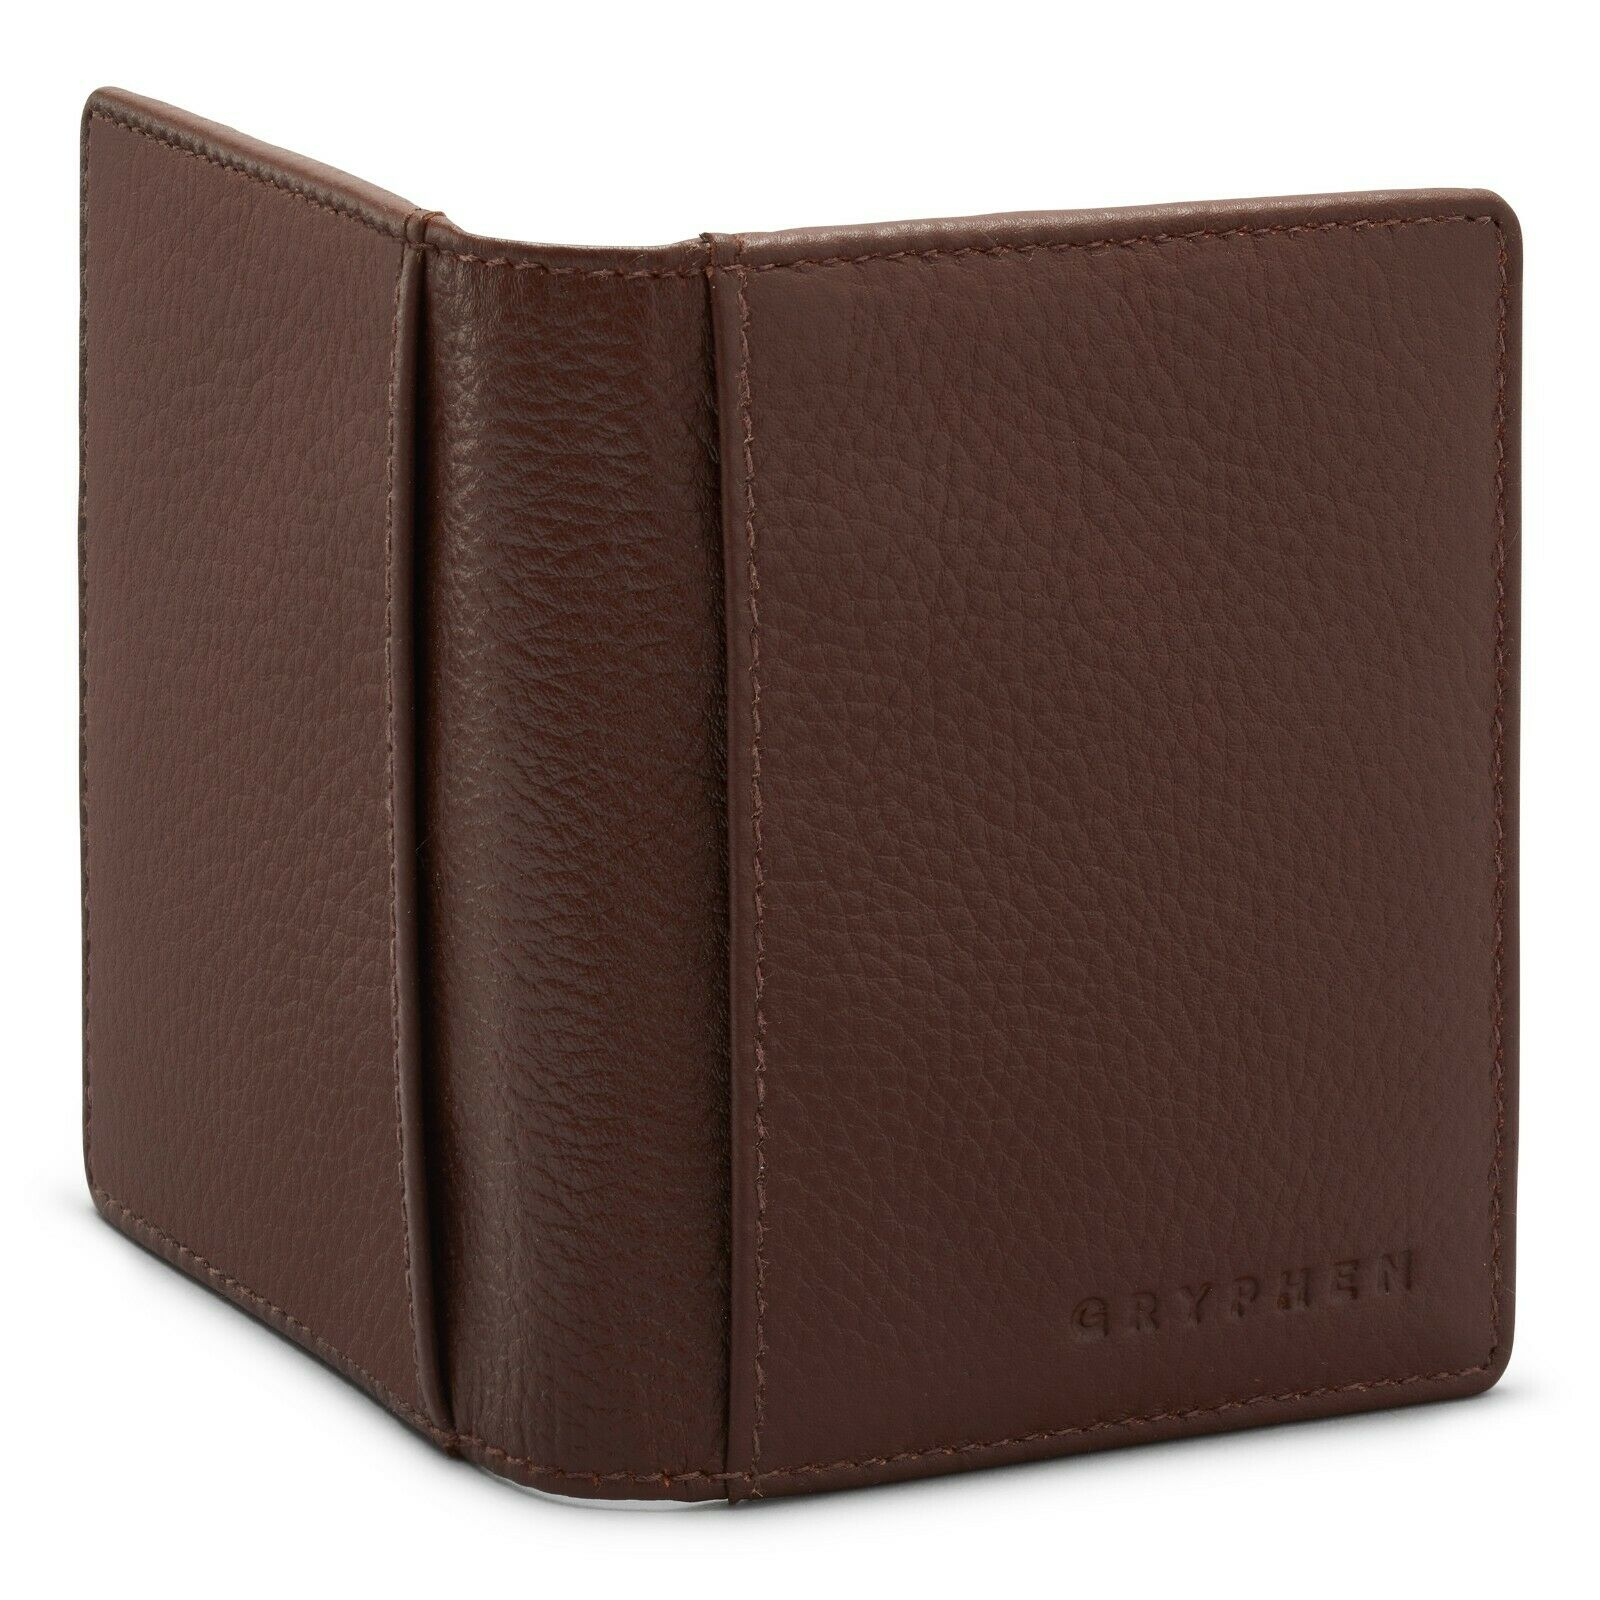 7 Colours available Italian Leather Bi Fold 20 Sleeve Credit Card Holder